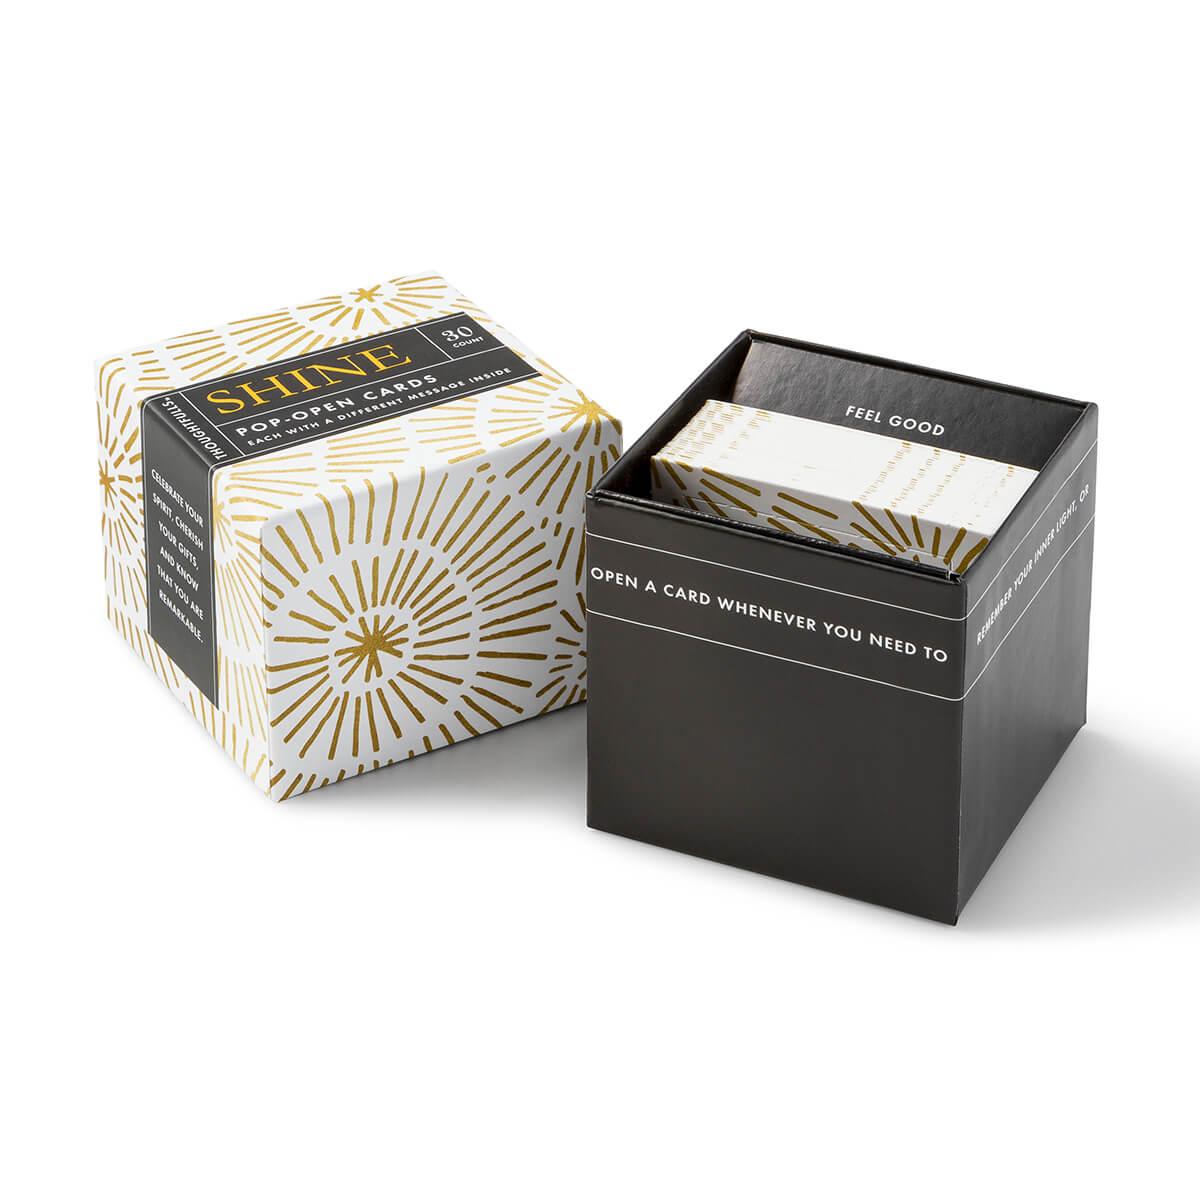 Thoughtfulls Shine Inspirational Cards - box